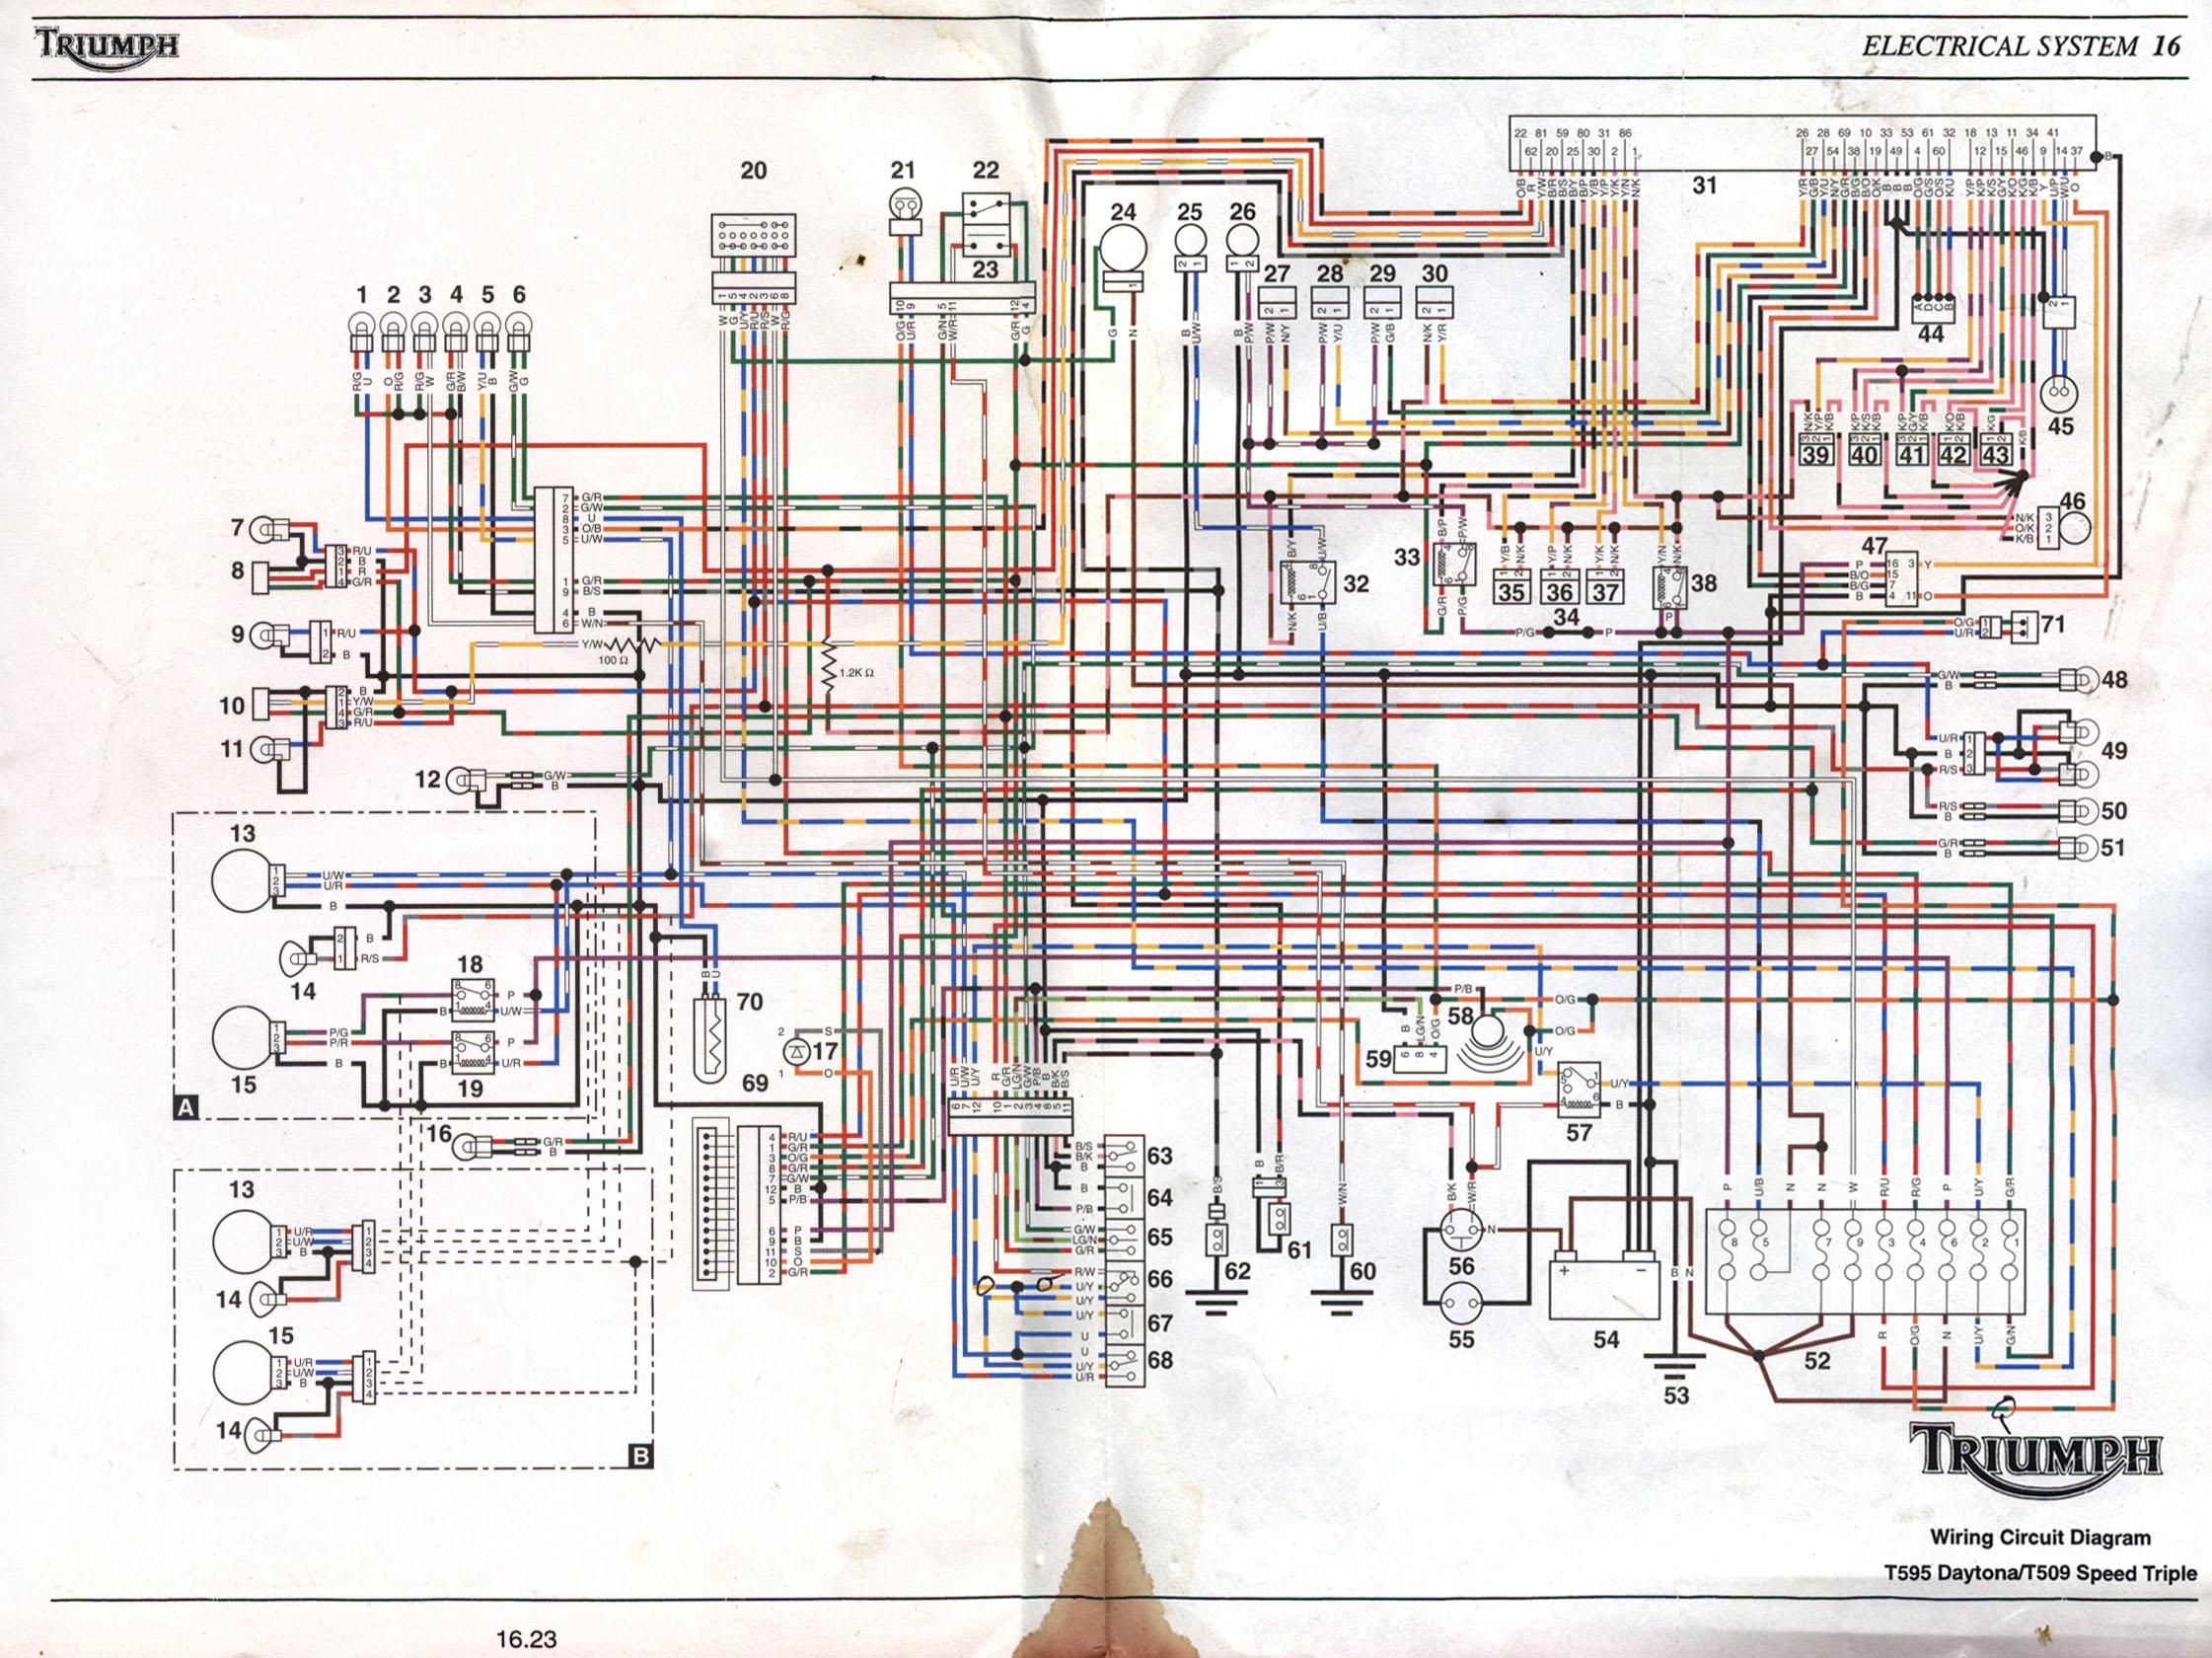 daytona wiring diagram?resize\\\\\\\\\\\\\\\\\\\\\\\\\\\\\=665%2C498 yamaha fzr 600 wiring diagram yamaha tt 250 wiring diagram \u2022 free 1993 Dodge Daytona at gsmx.co